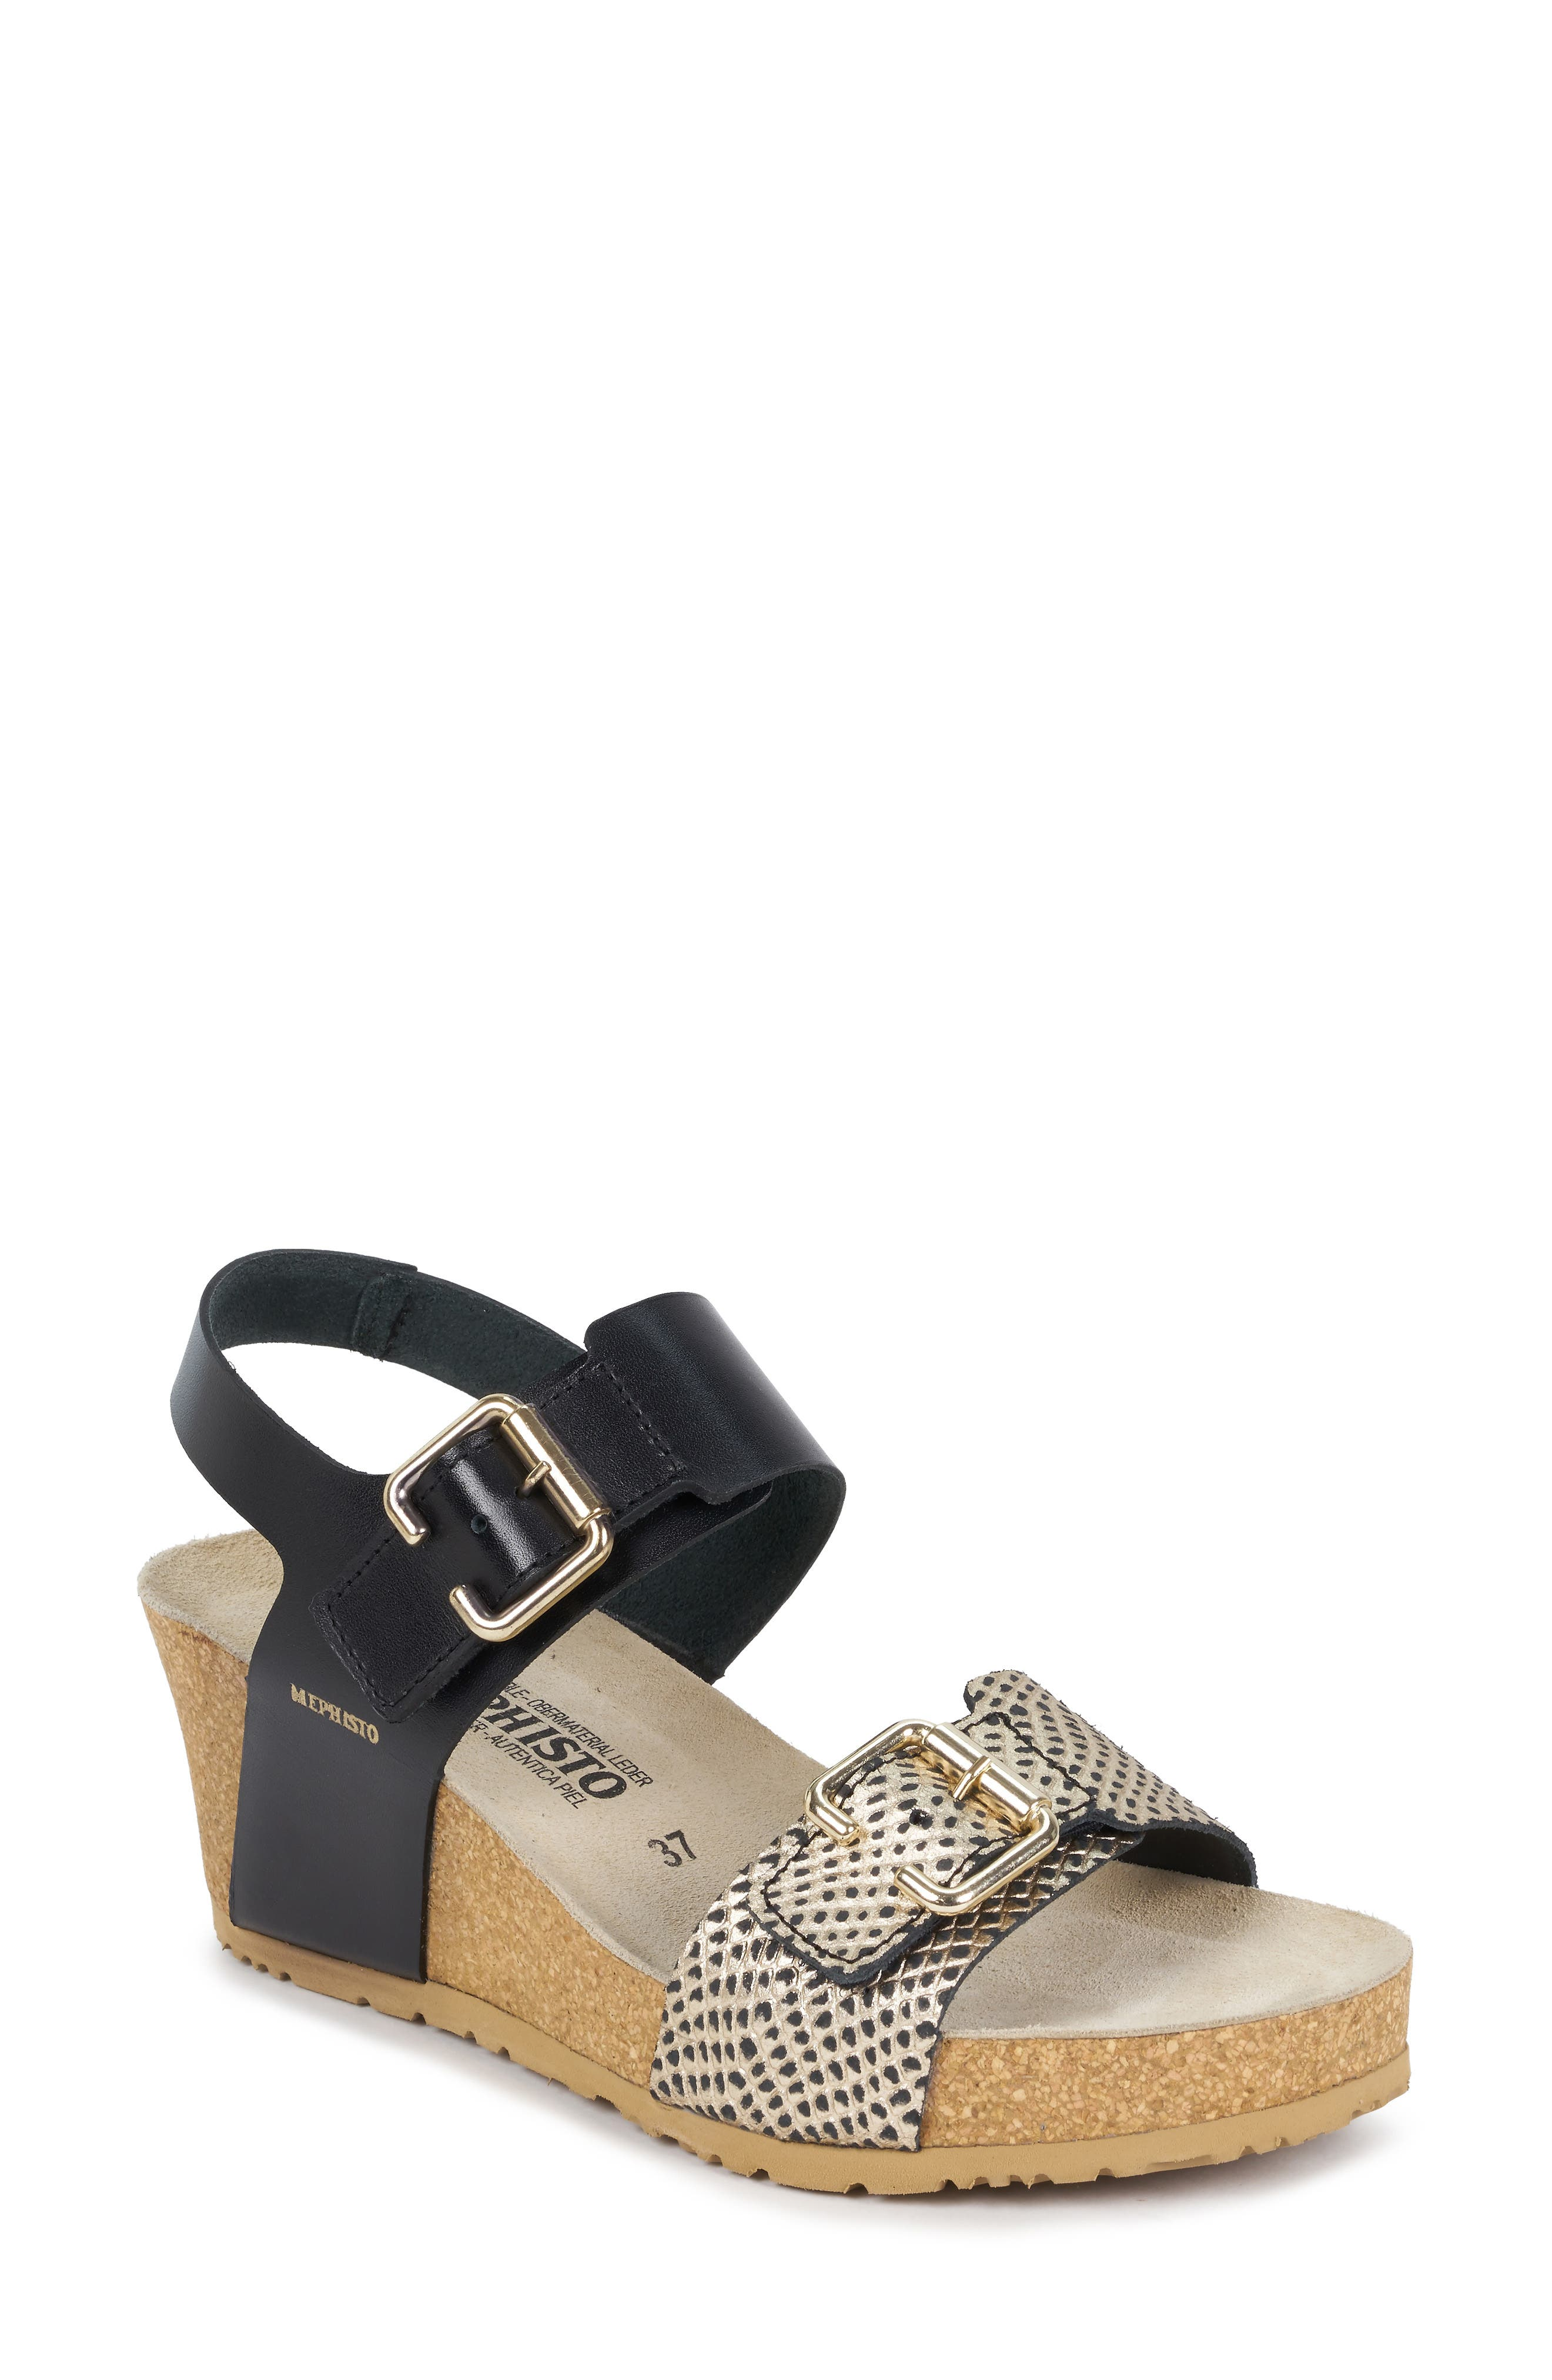 MEPHISTO, Lissandra Platform Wedge Sandal, Main thumbnail 1, color, BLACK/ GOLD LEATHER